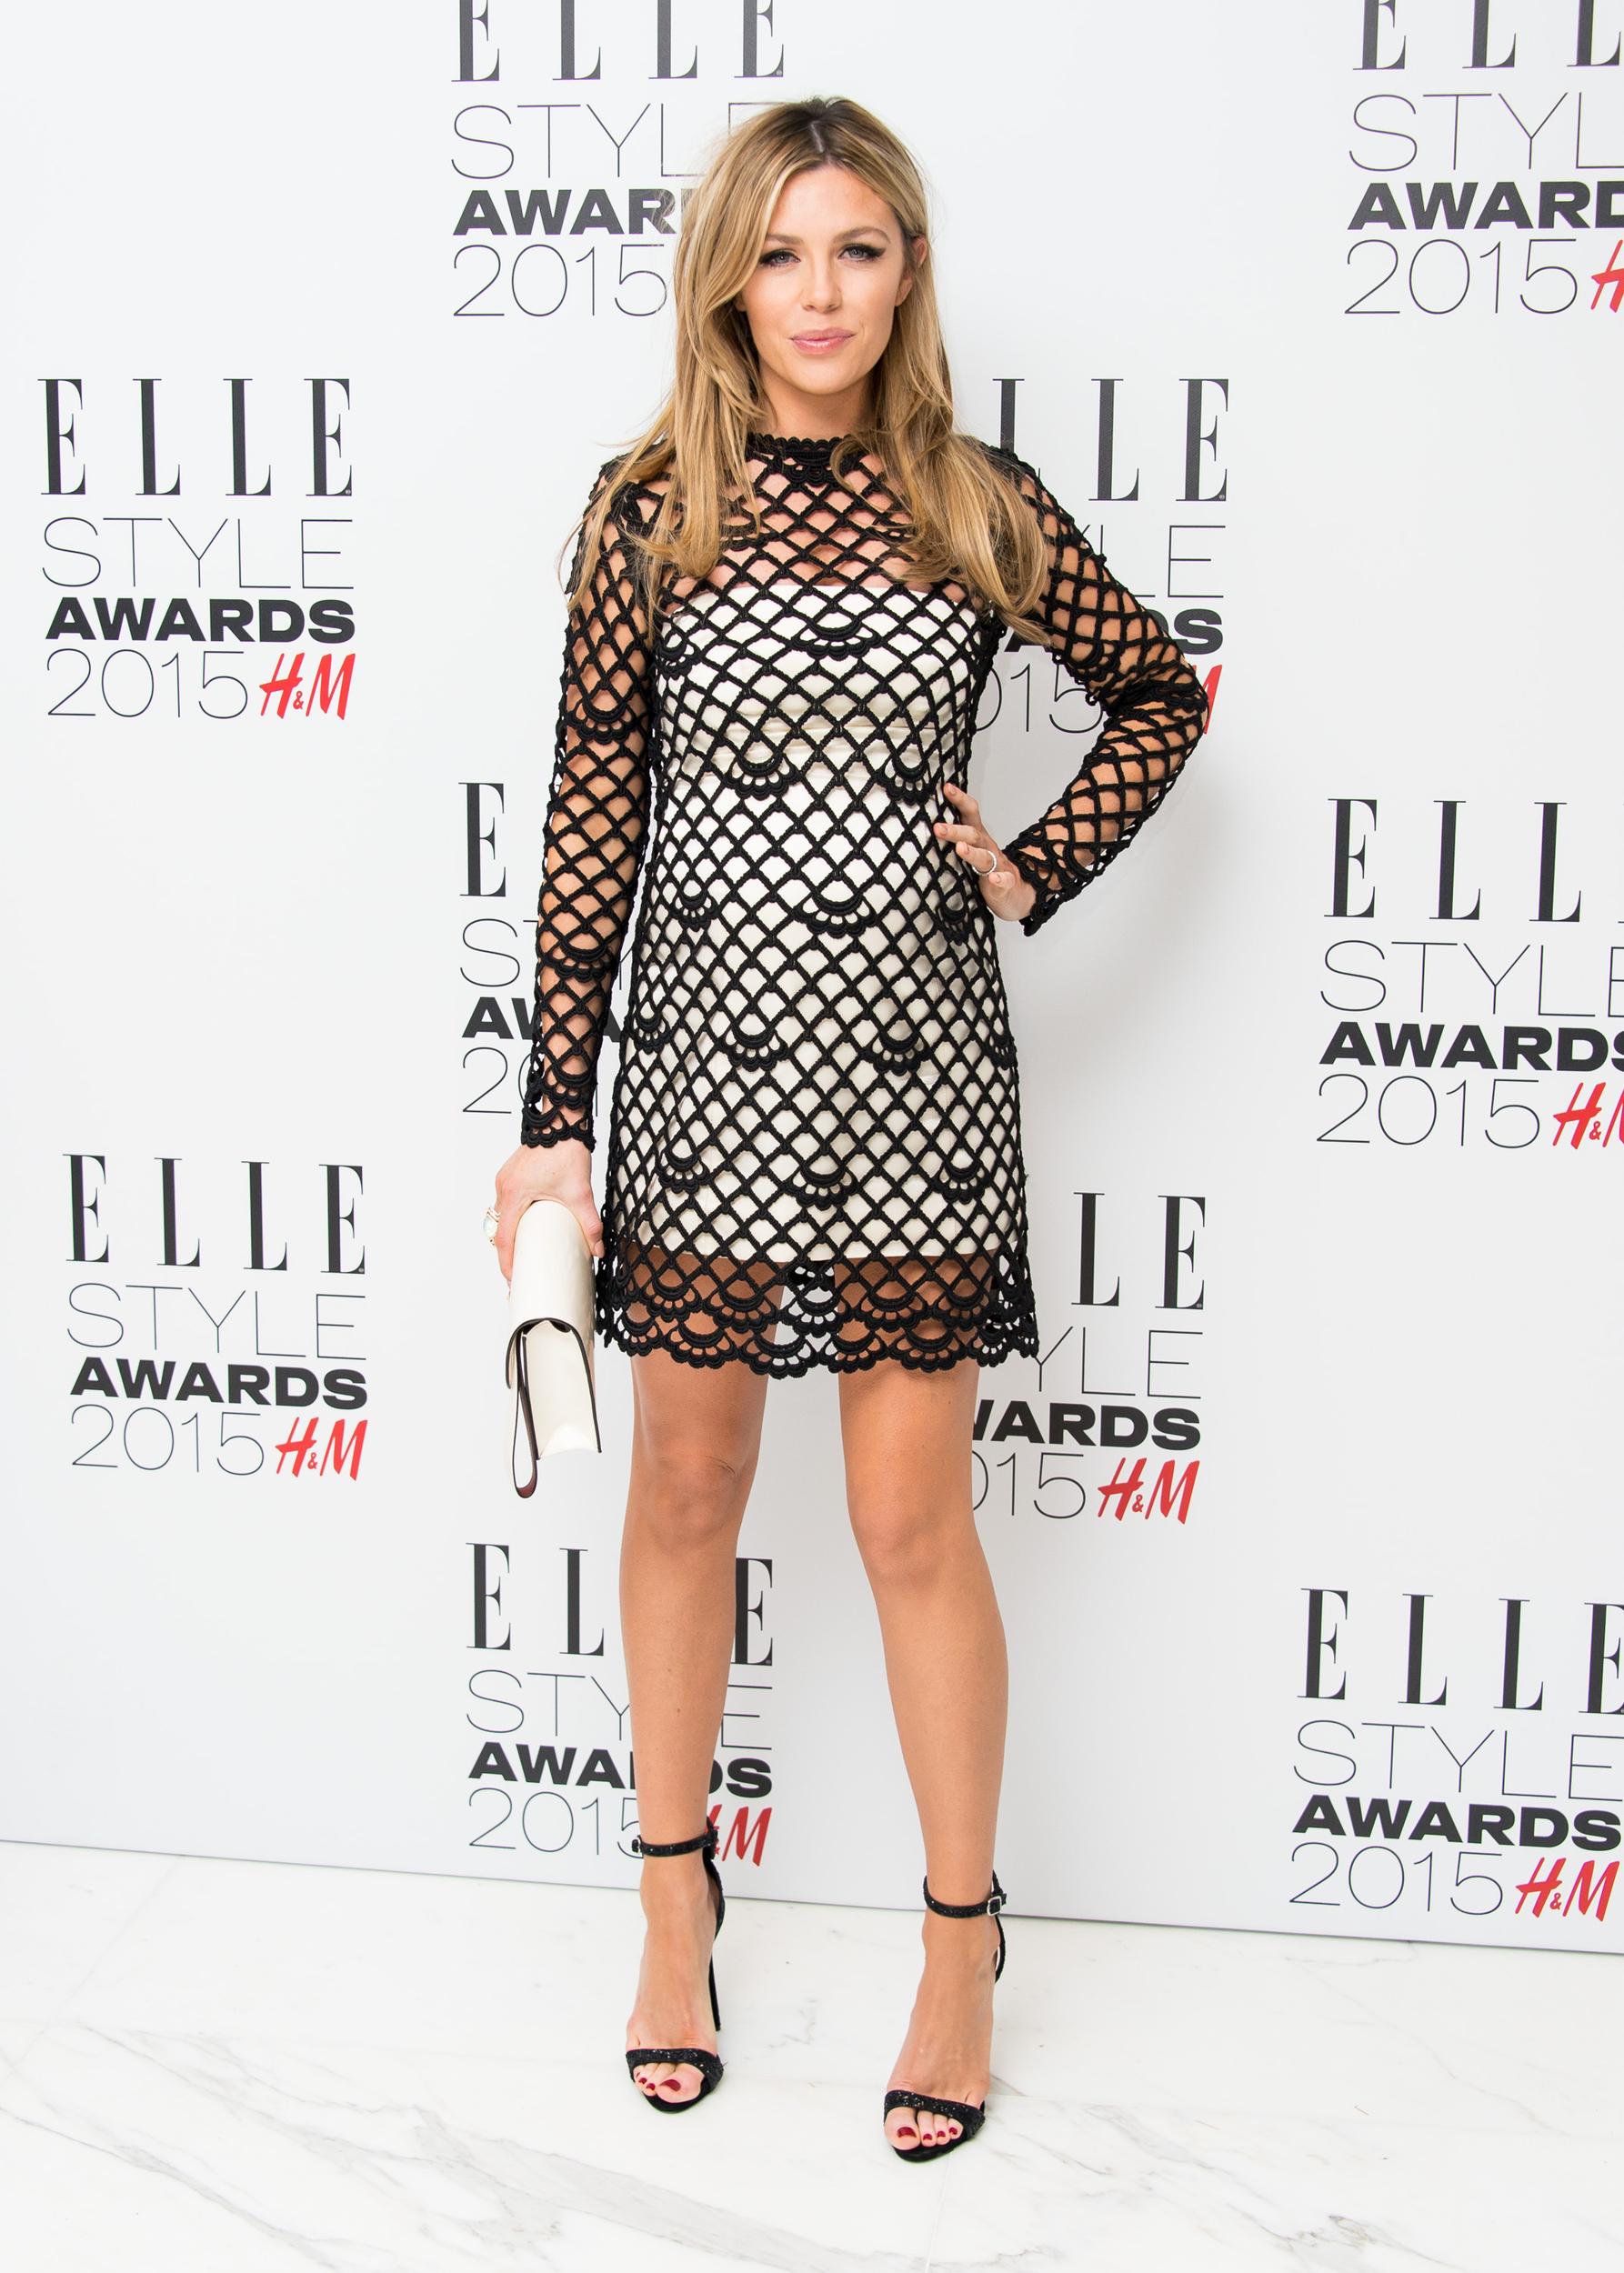 elle-style-awards-2015-